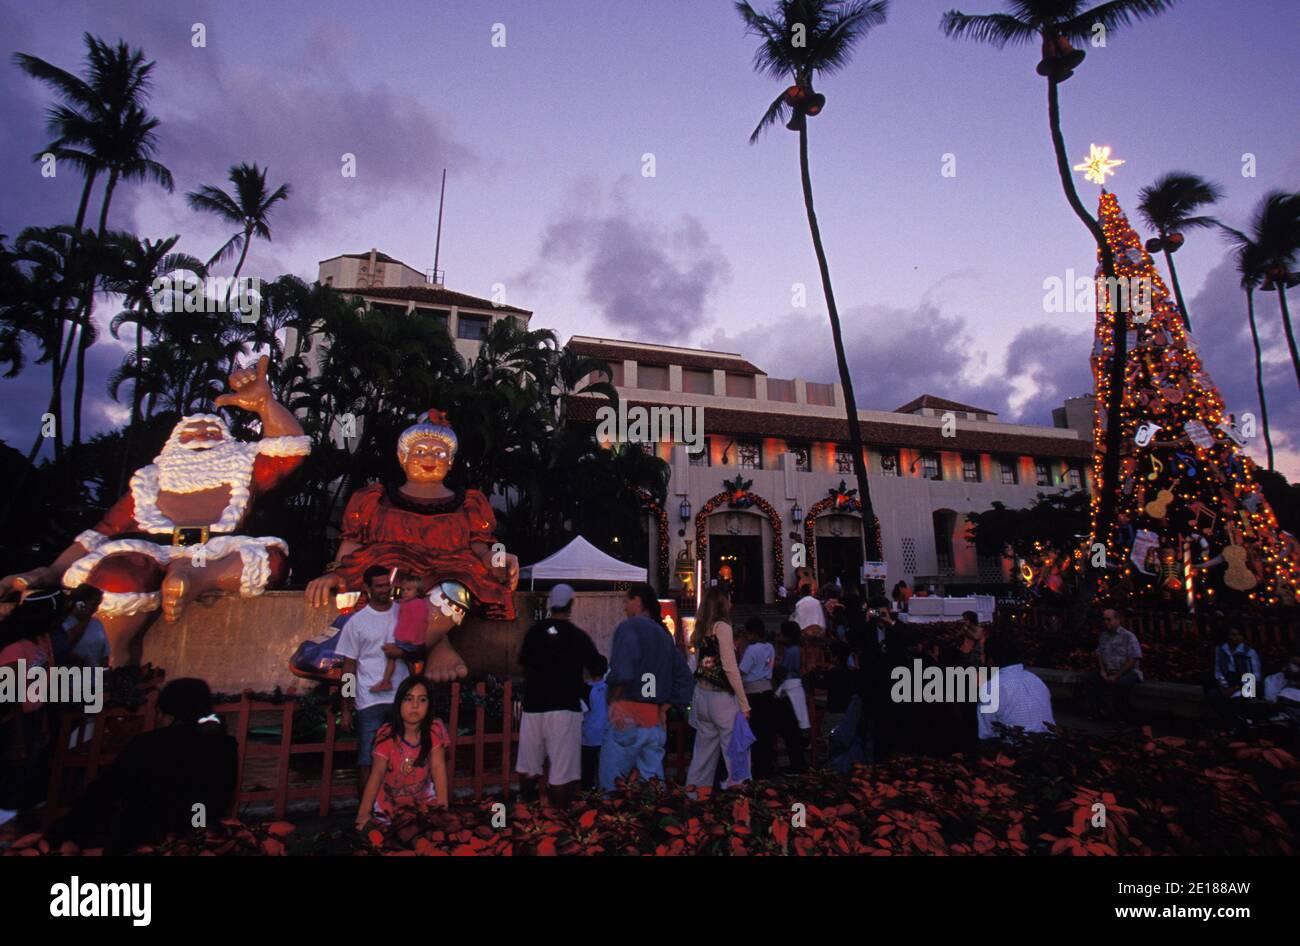 families enjoy Christmas decorations at Honolulu hale, in Downtown Honolulu Foto de stock